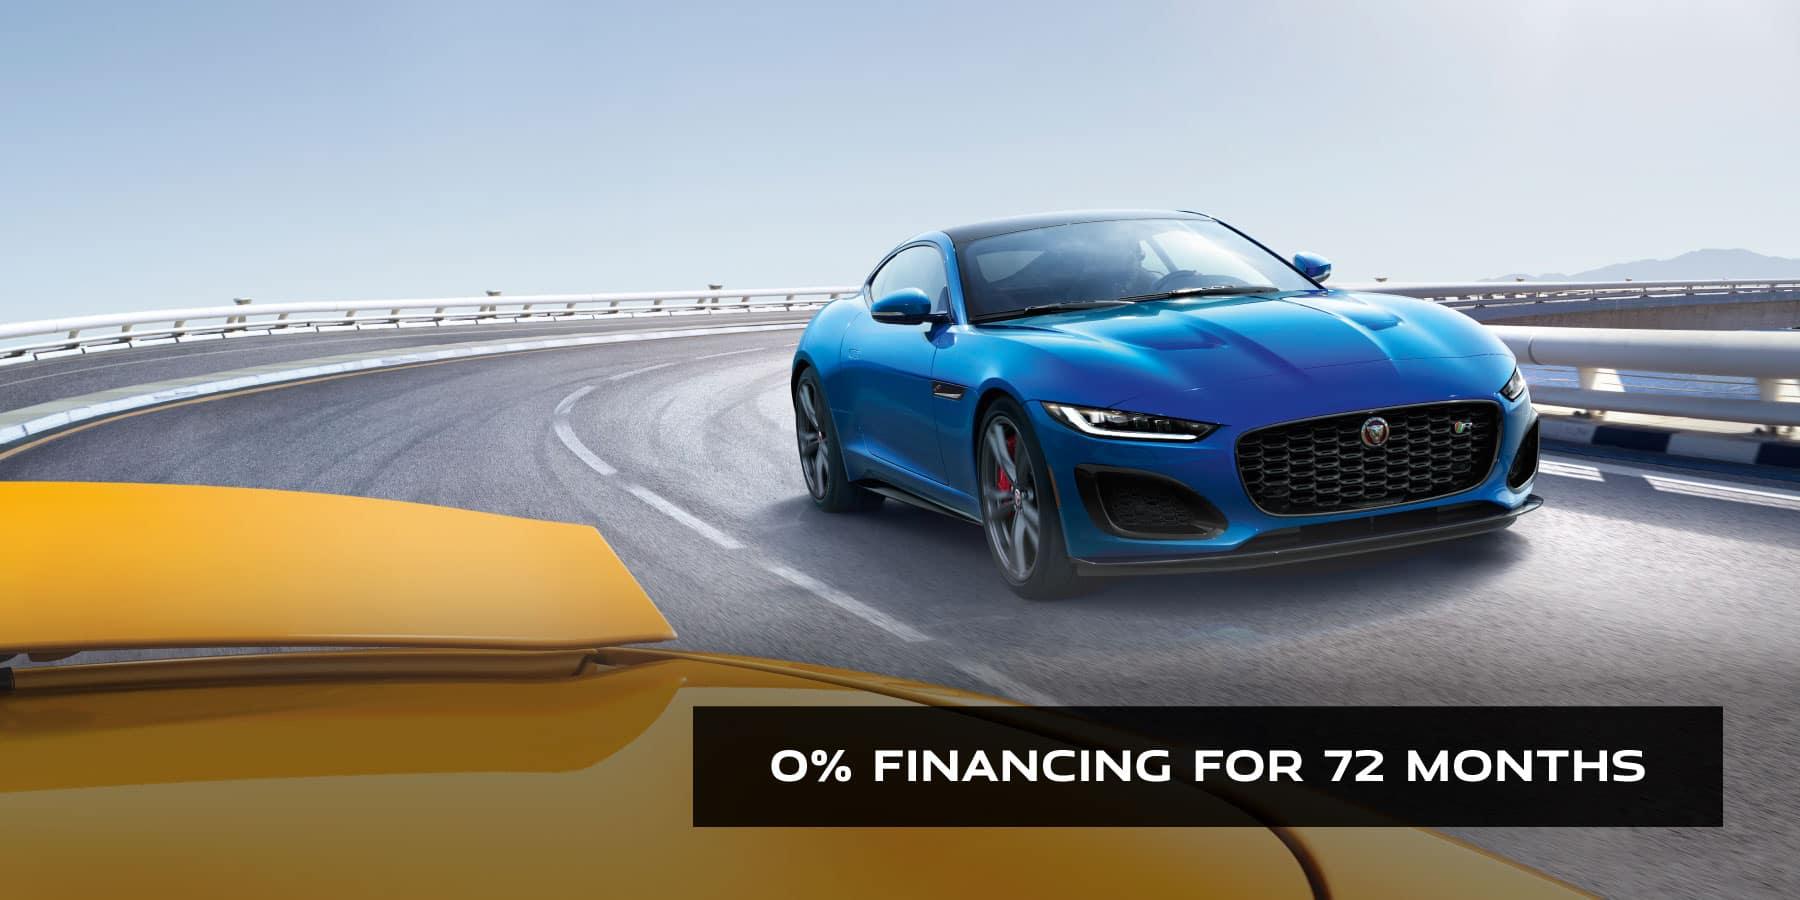 Autobahn Jaguar Fort Worth | 0% Financing for 72 Months!